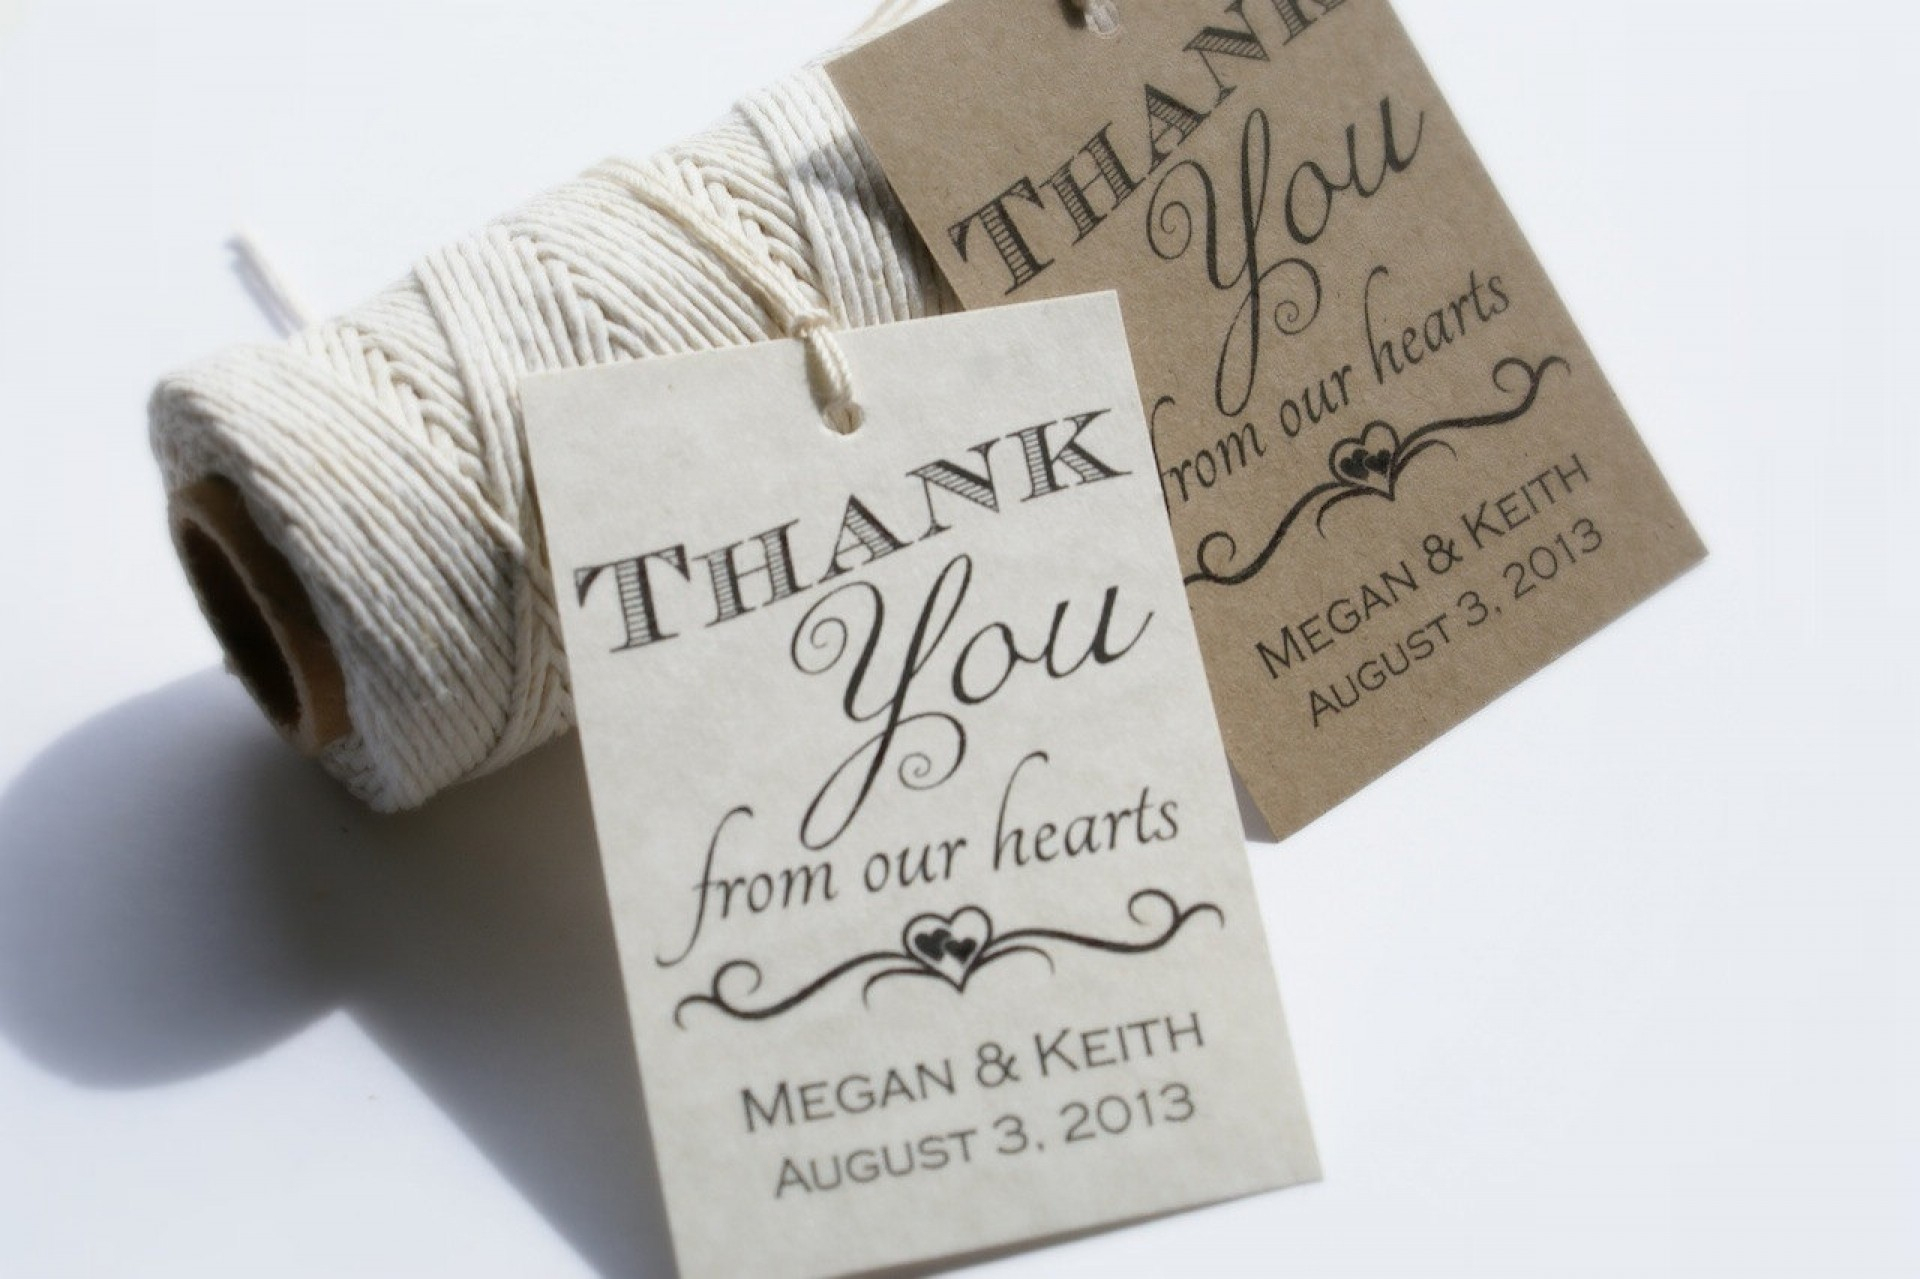 013 Template Ideas Wedding Favor Tag Templates Thank You Tags - Free Printable Wedding Thank You Tags